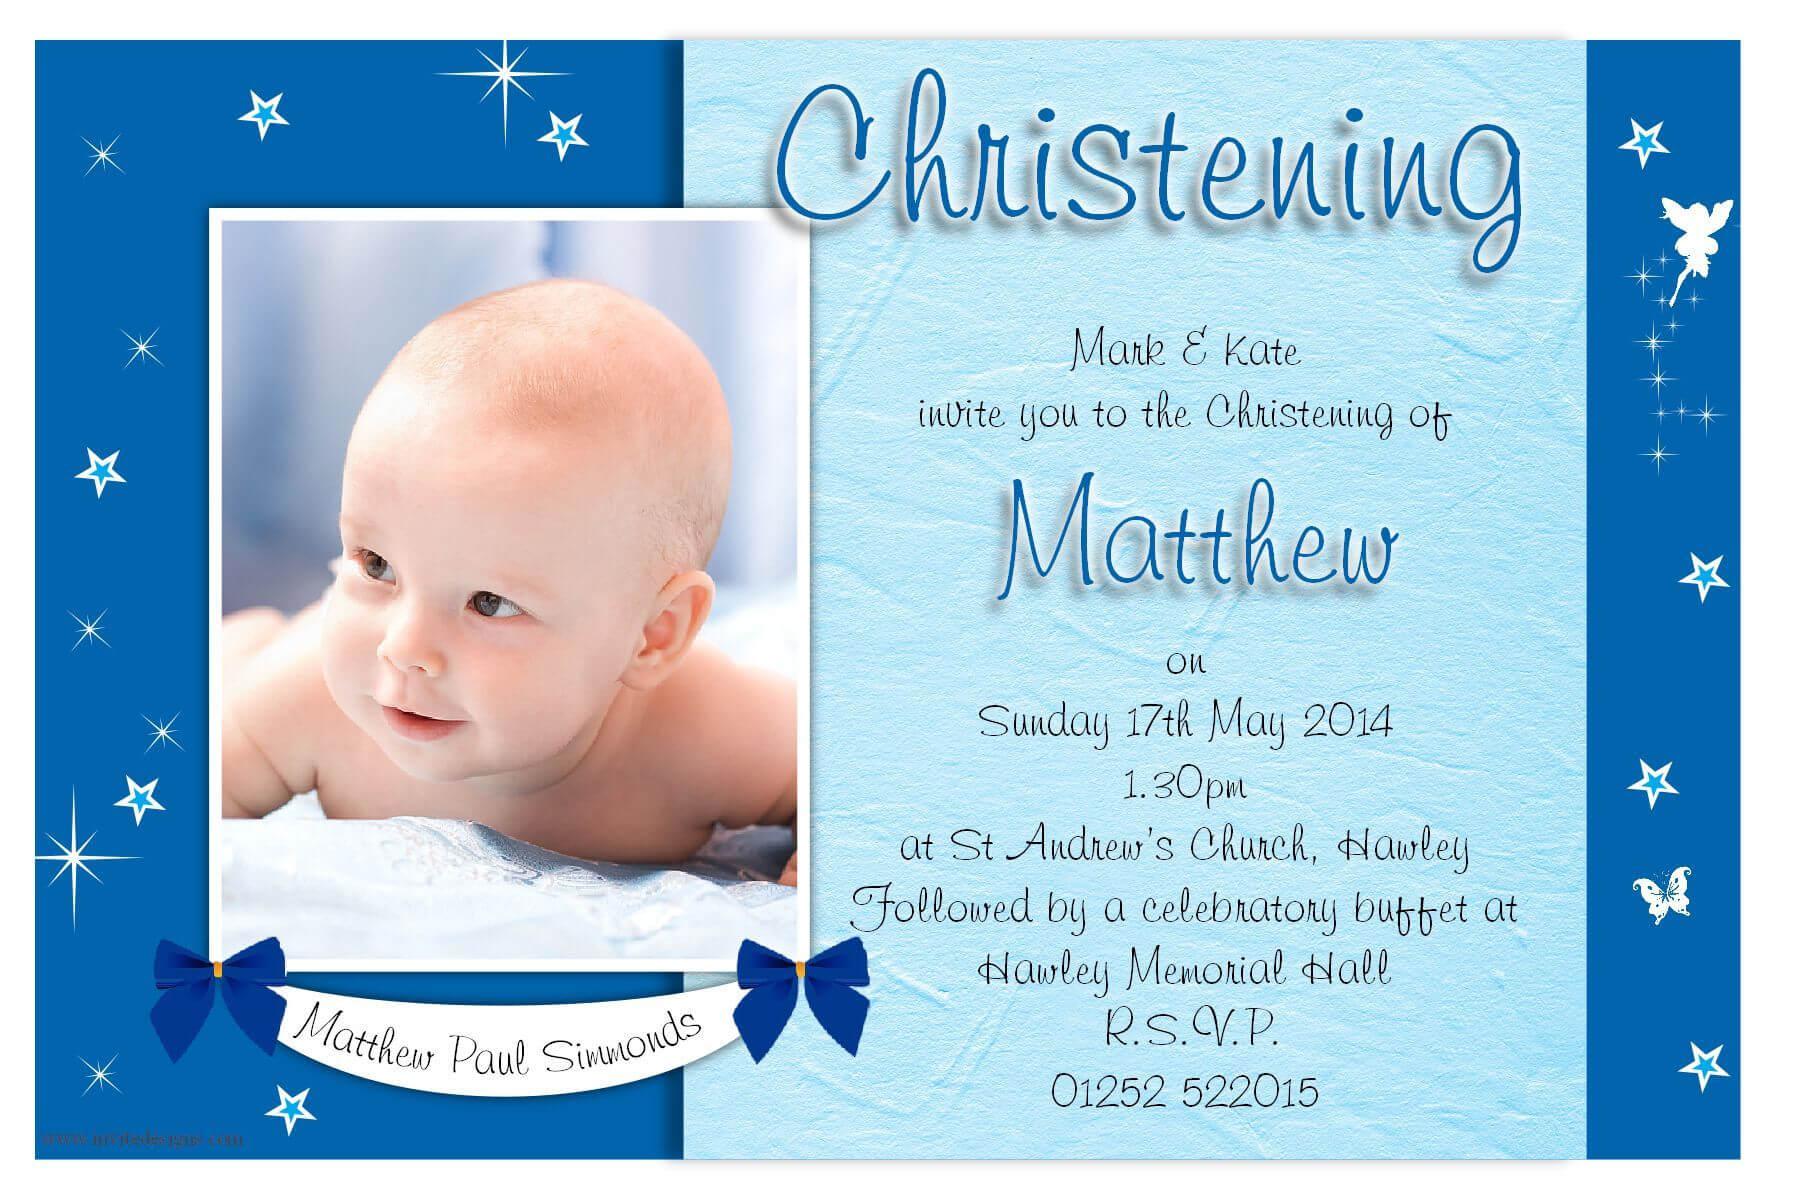 Free Christening Invitation Template Printable   Cakes In Throughout Free Christening Invitation Cards Templates